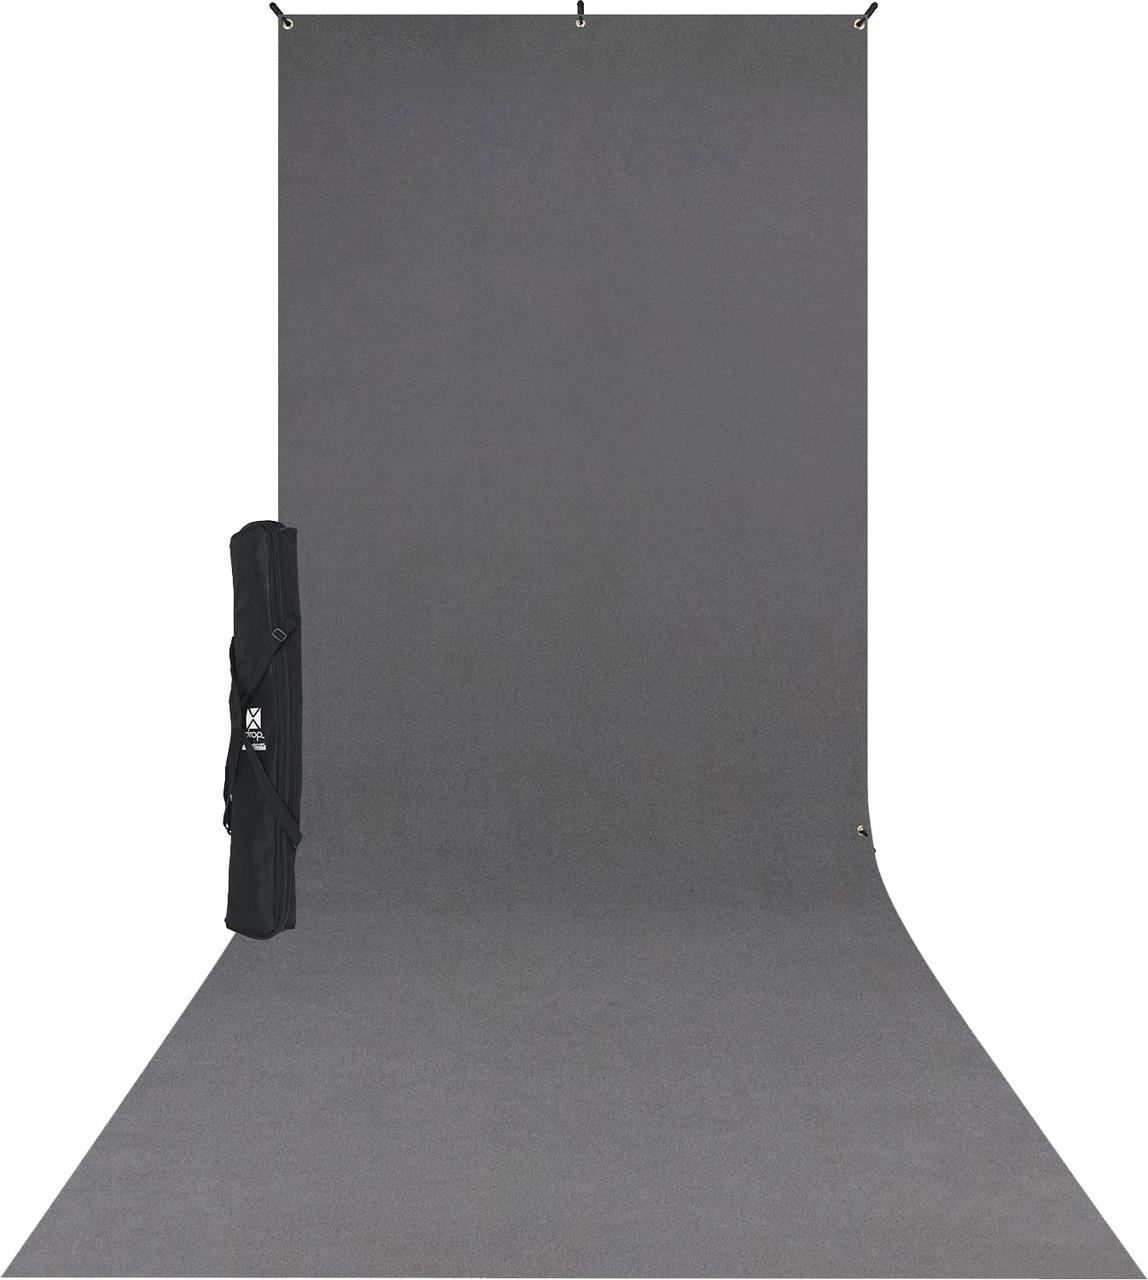 Westcott X-Drop Kit (5 x 12', Neutral Gray)